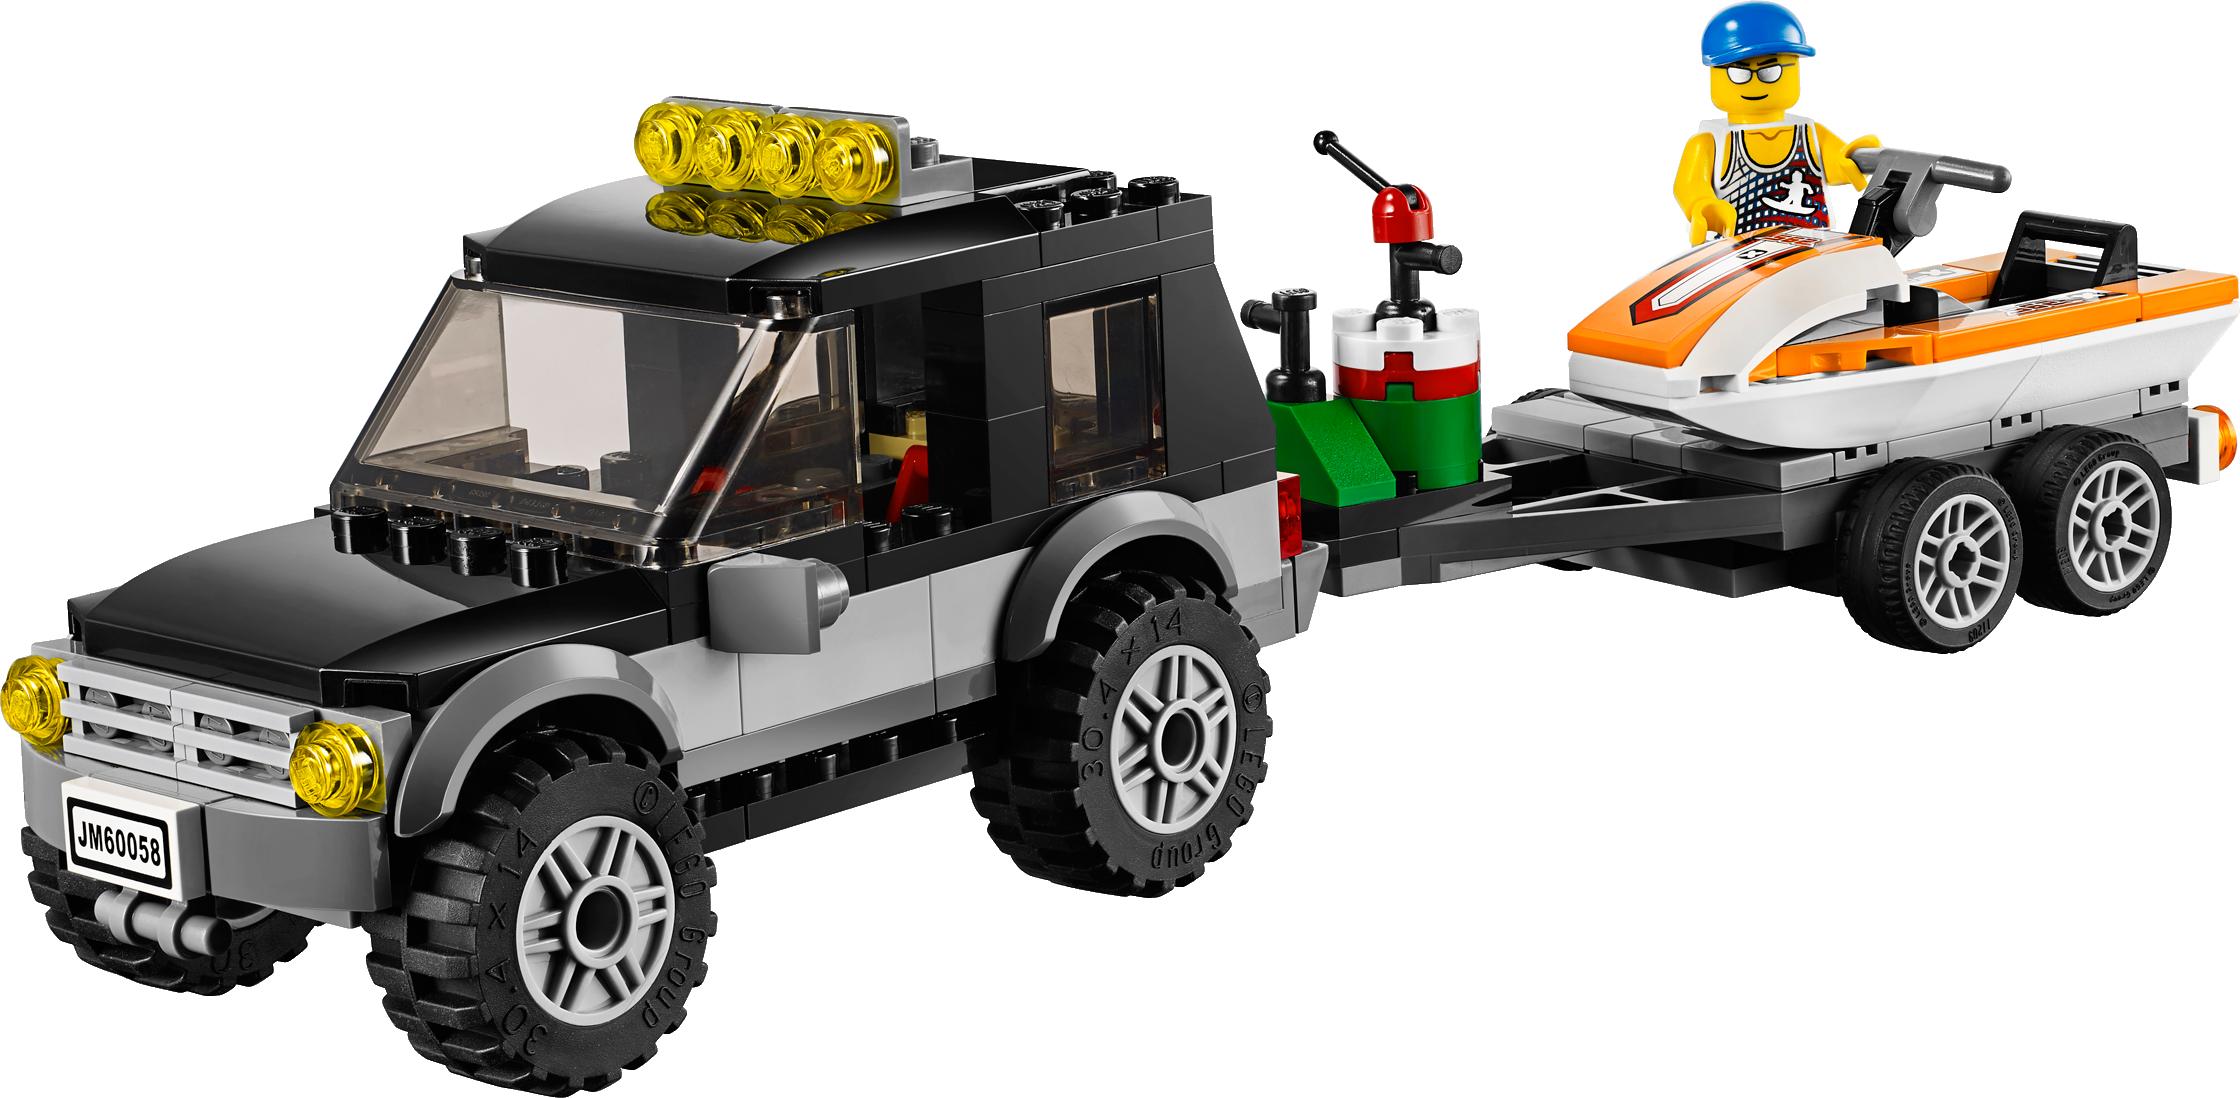 SUV with Watercraft